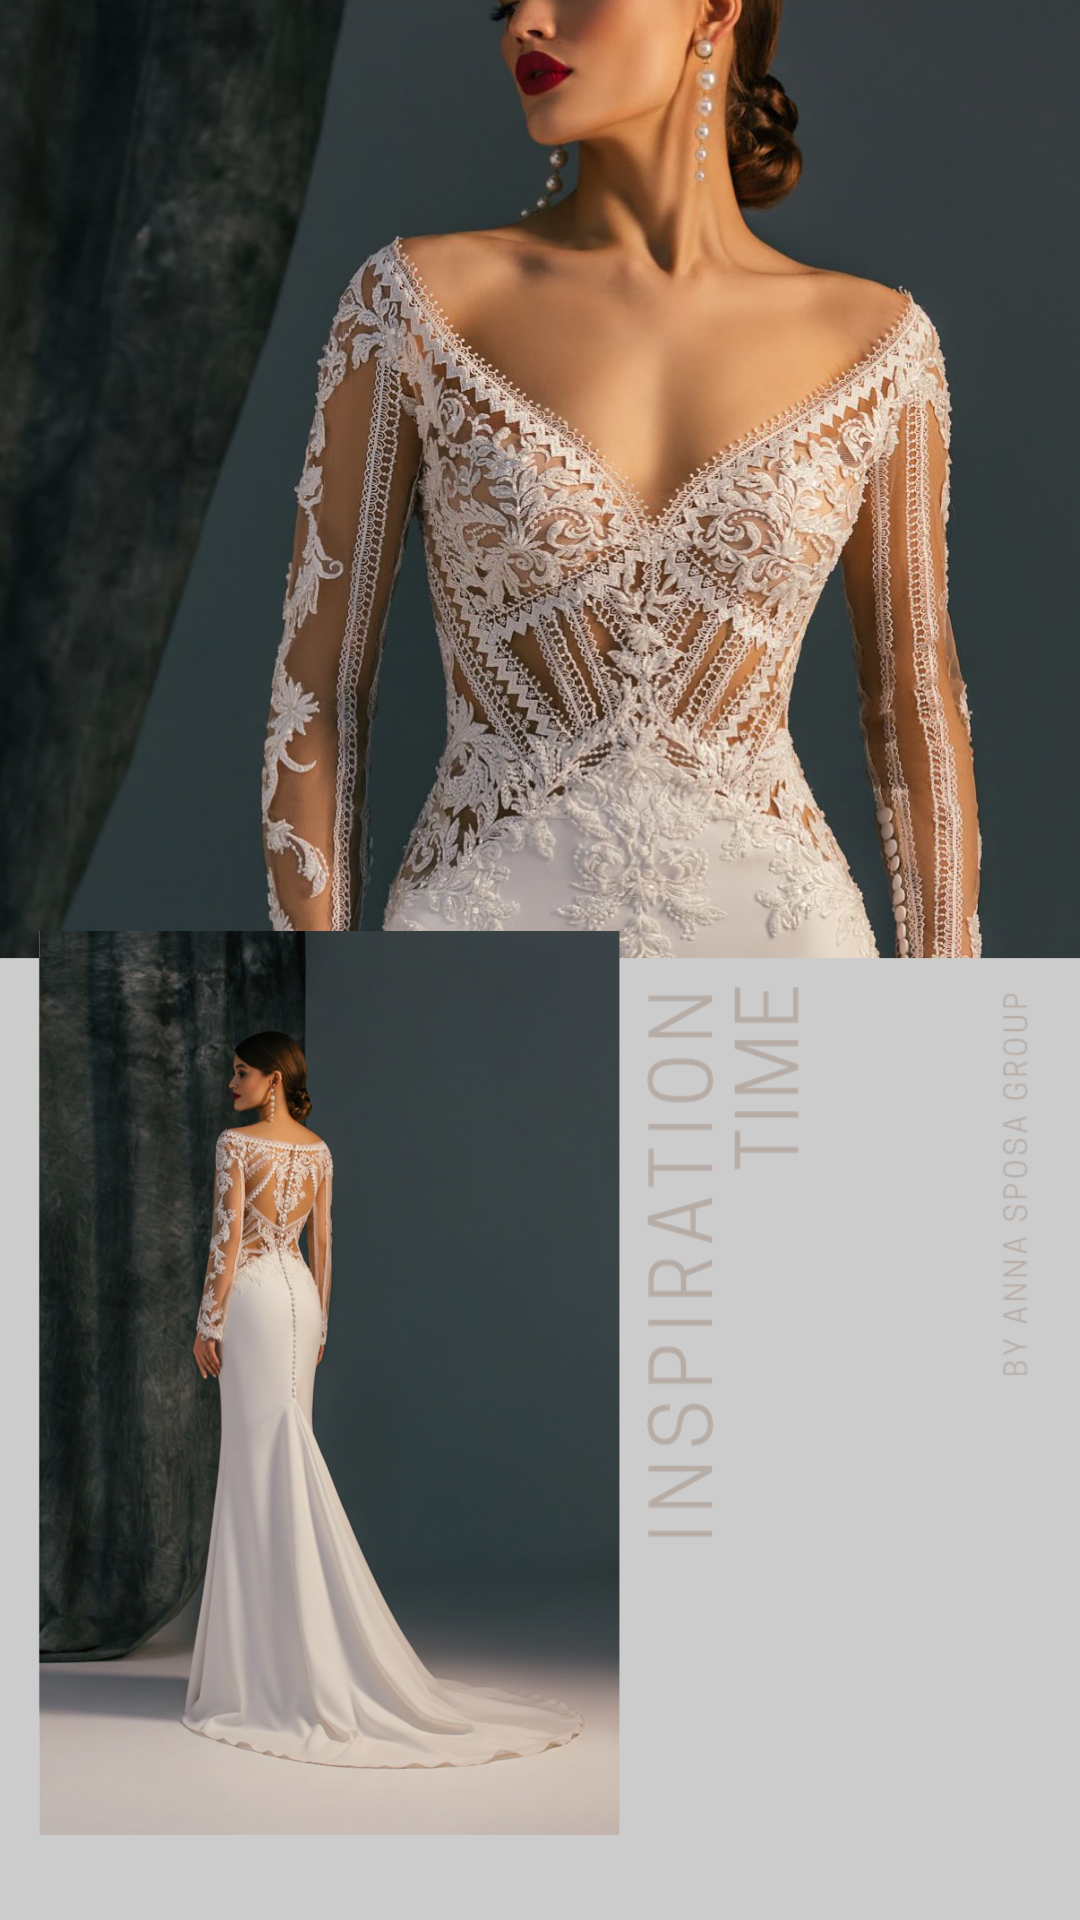 Carissa Wedding Dress Magic Balance Collection Elegant Wedding Dress Elegant Wedding Dress Mermaid Simple Lace Wedding Dress [ 1920 x 1080 Pixel ]